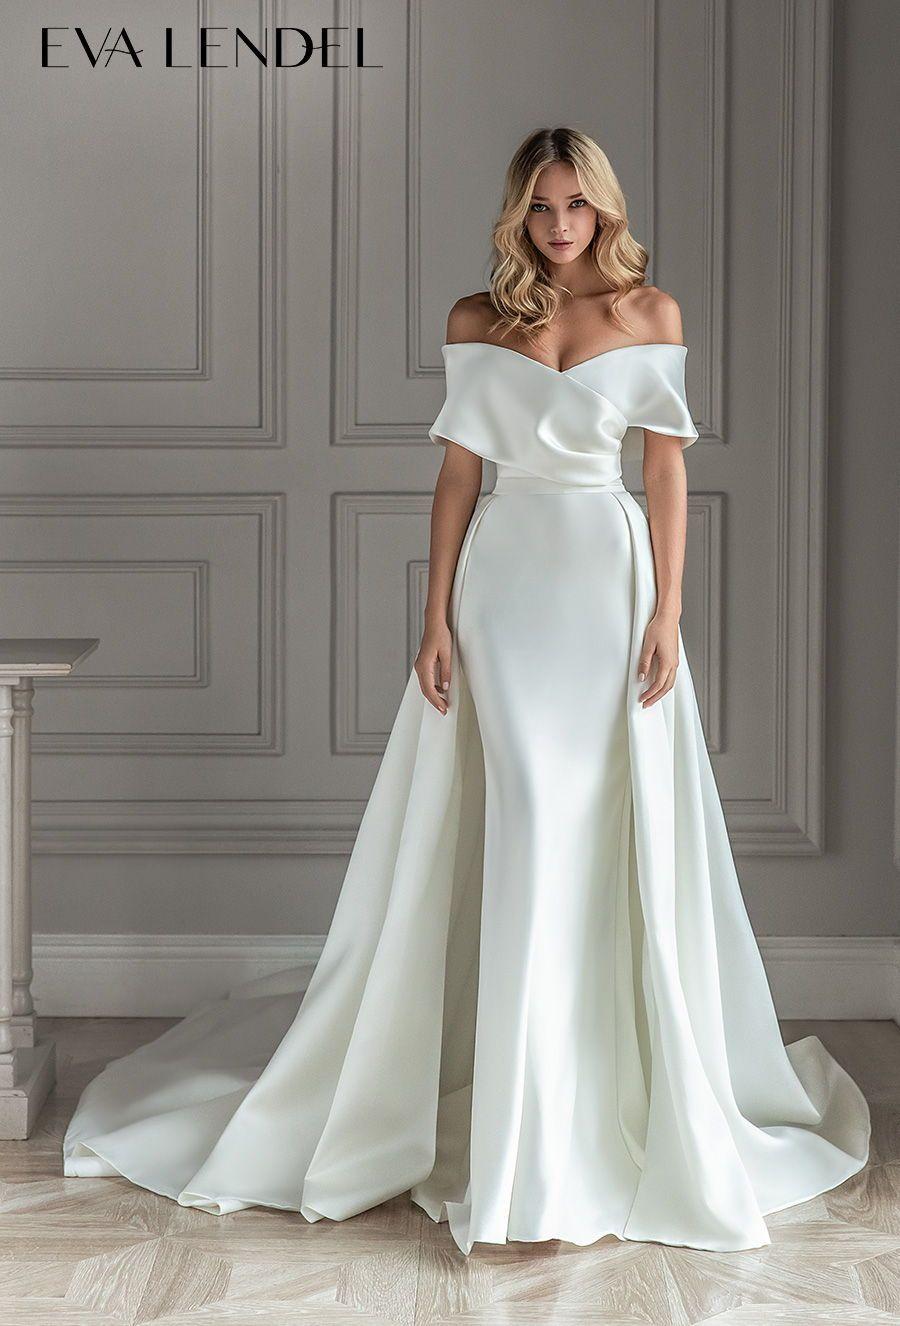 Eva Lendel 2021 Wedding Dresses Less Is More Bridal Collection Wedding Inspirasi Glamourous Wedding Dress Wedding Dress Guide Bridal Dresses [ 1326 x 900 Pixel ]